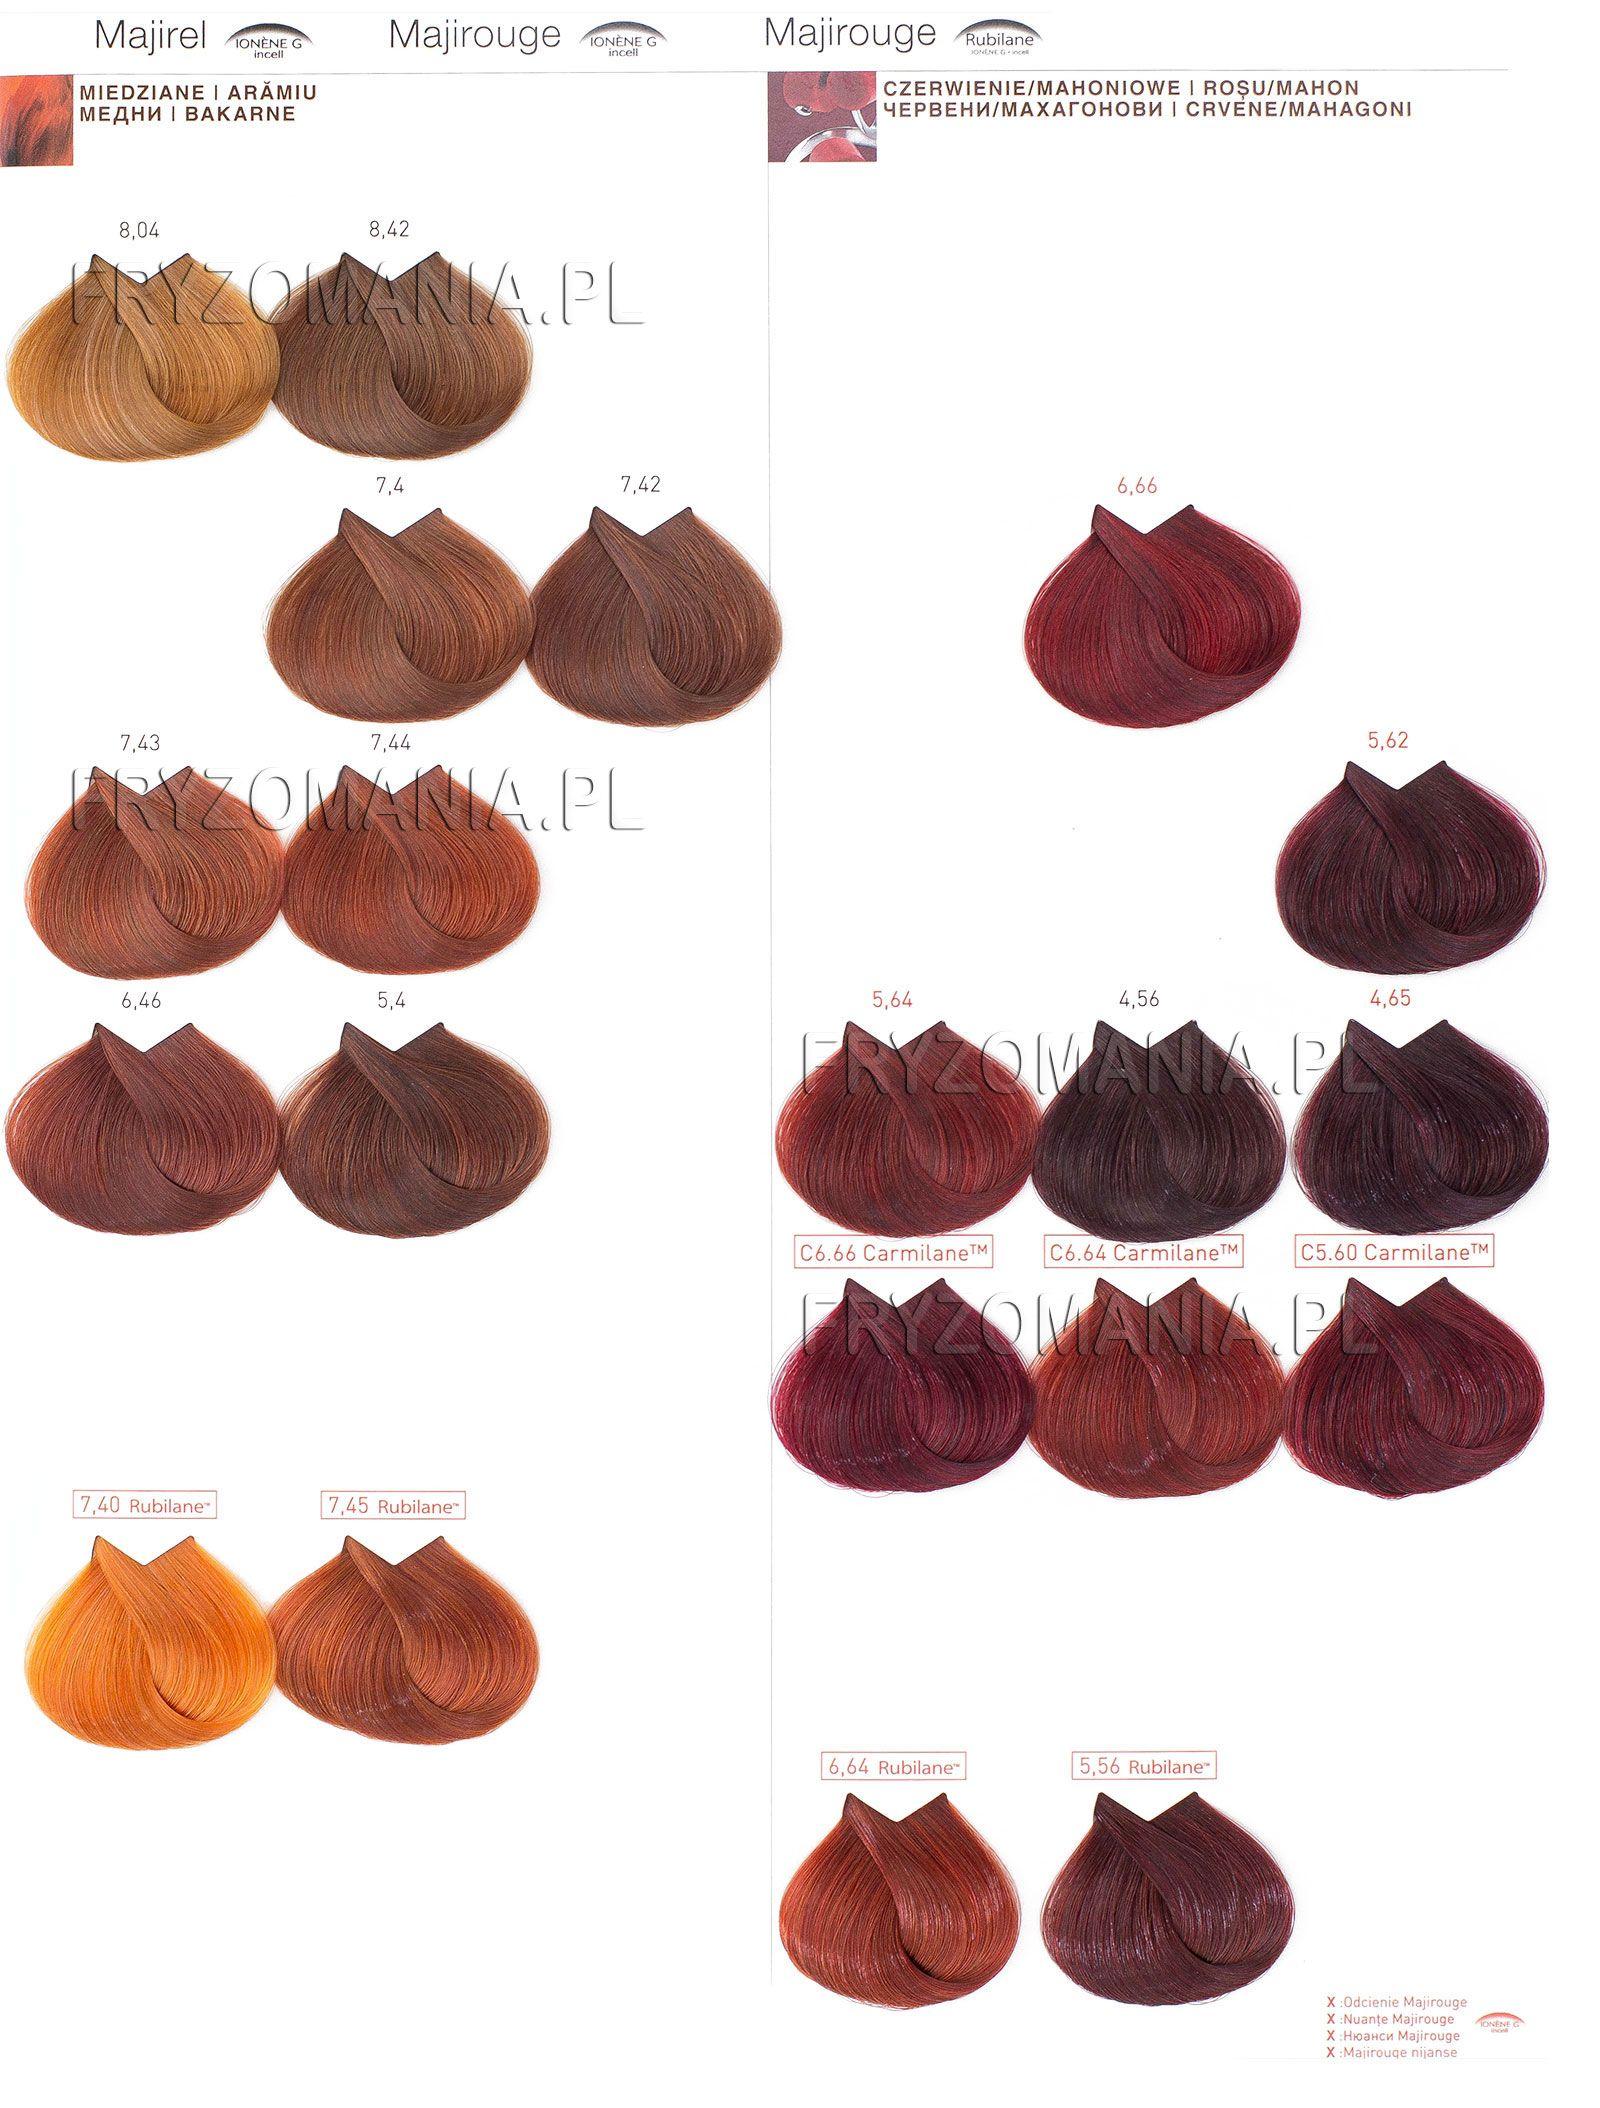 Majirel colour chart - Loreal Majirel Majirouge Farba Do W Os W Koloryzacja Trwa A 50ml Fryzomania Pl Chartshair Colourshair